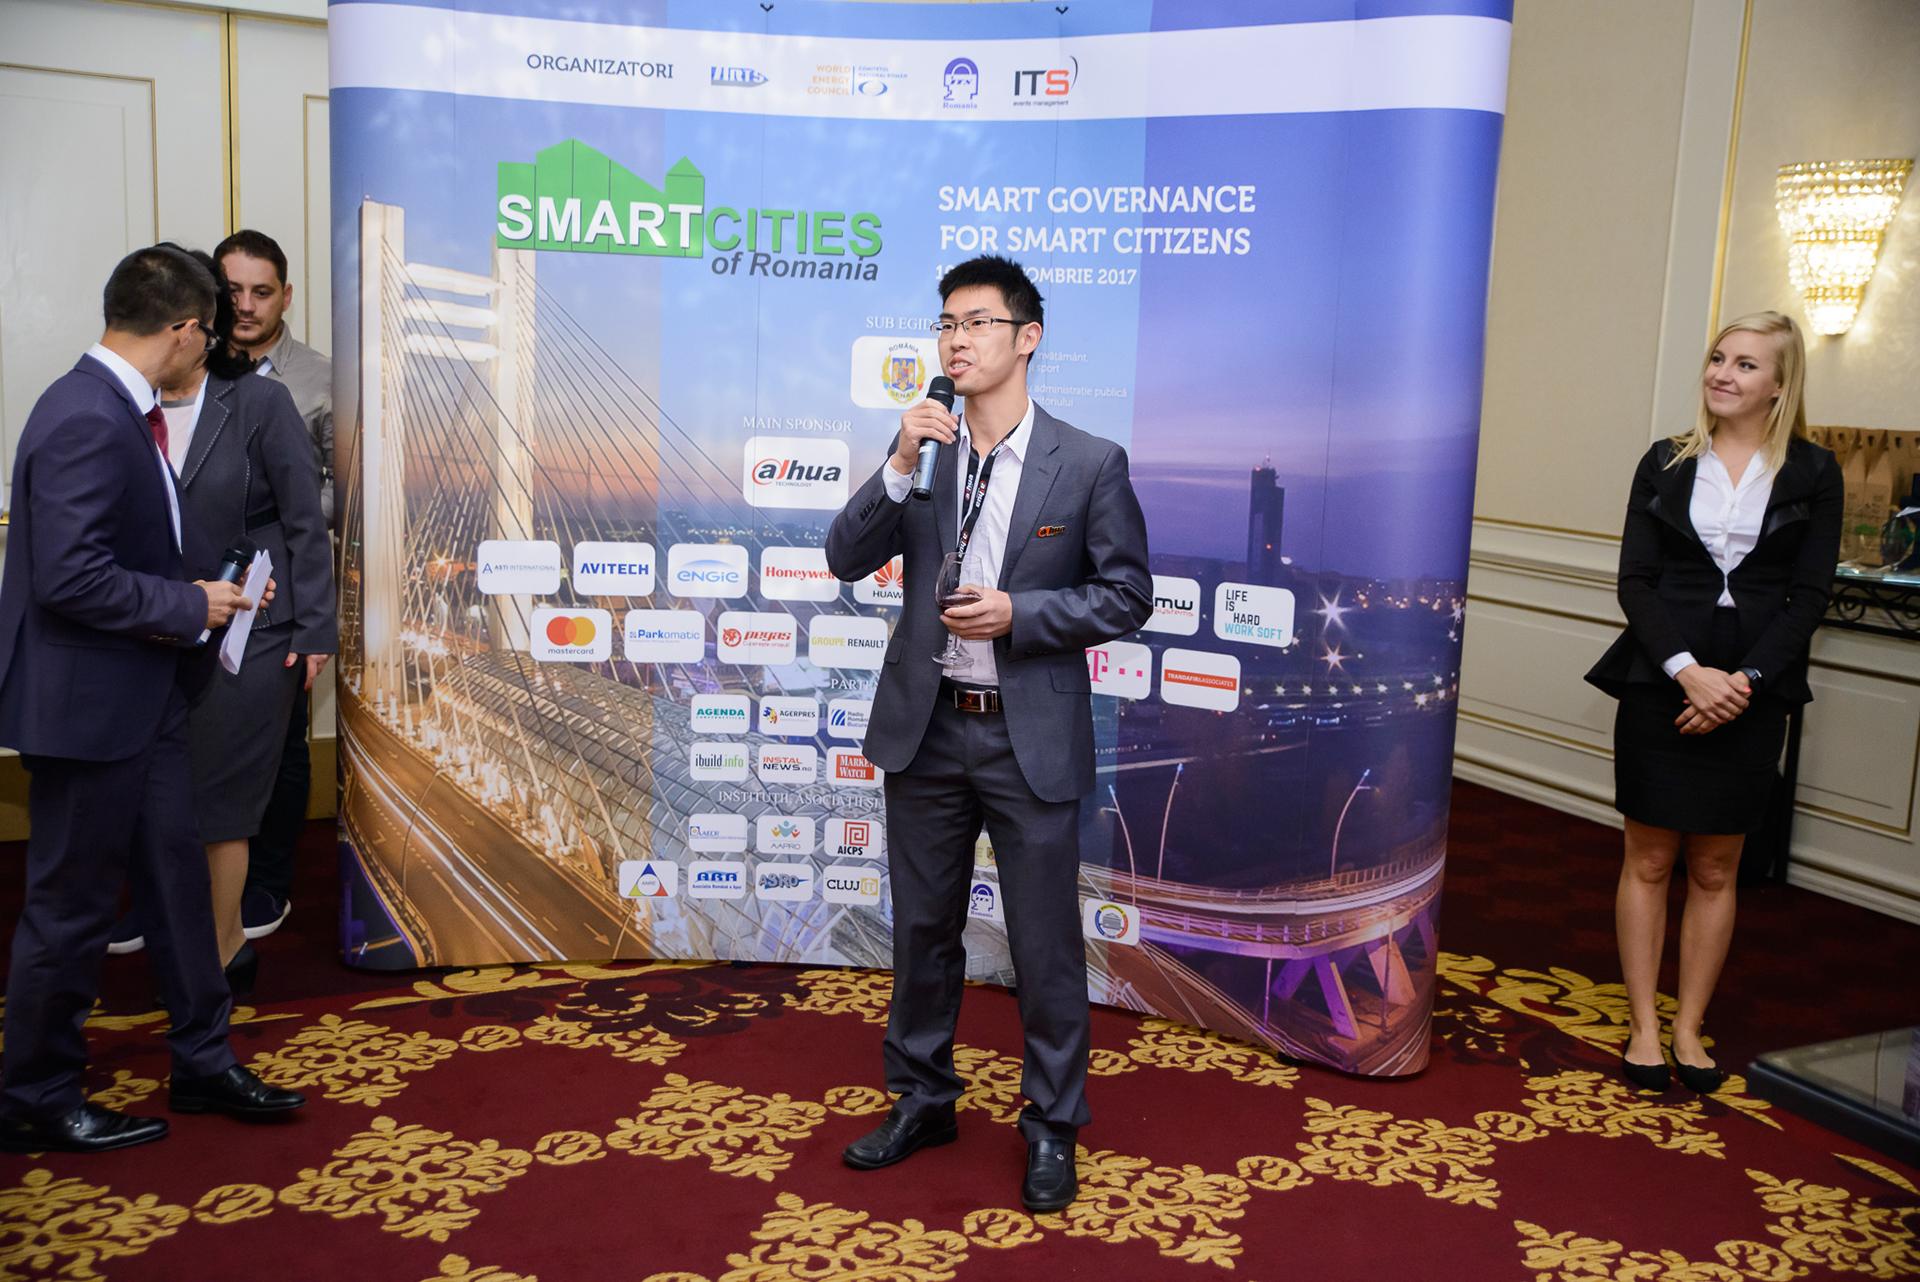 Smart-Cities-Of-Romania-2017---ITS-668